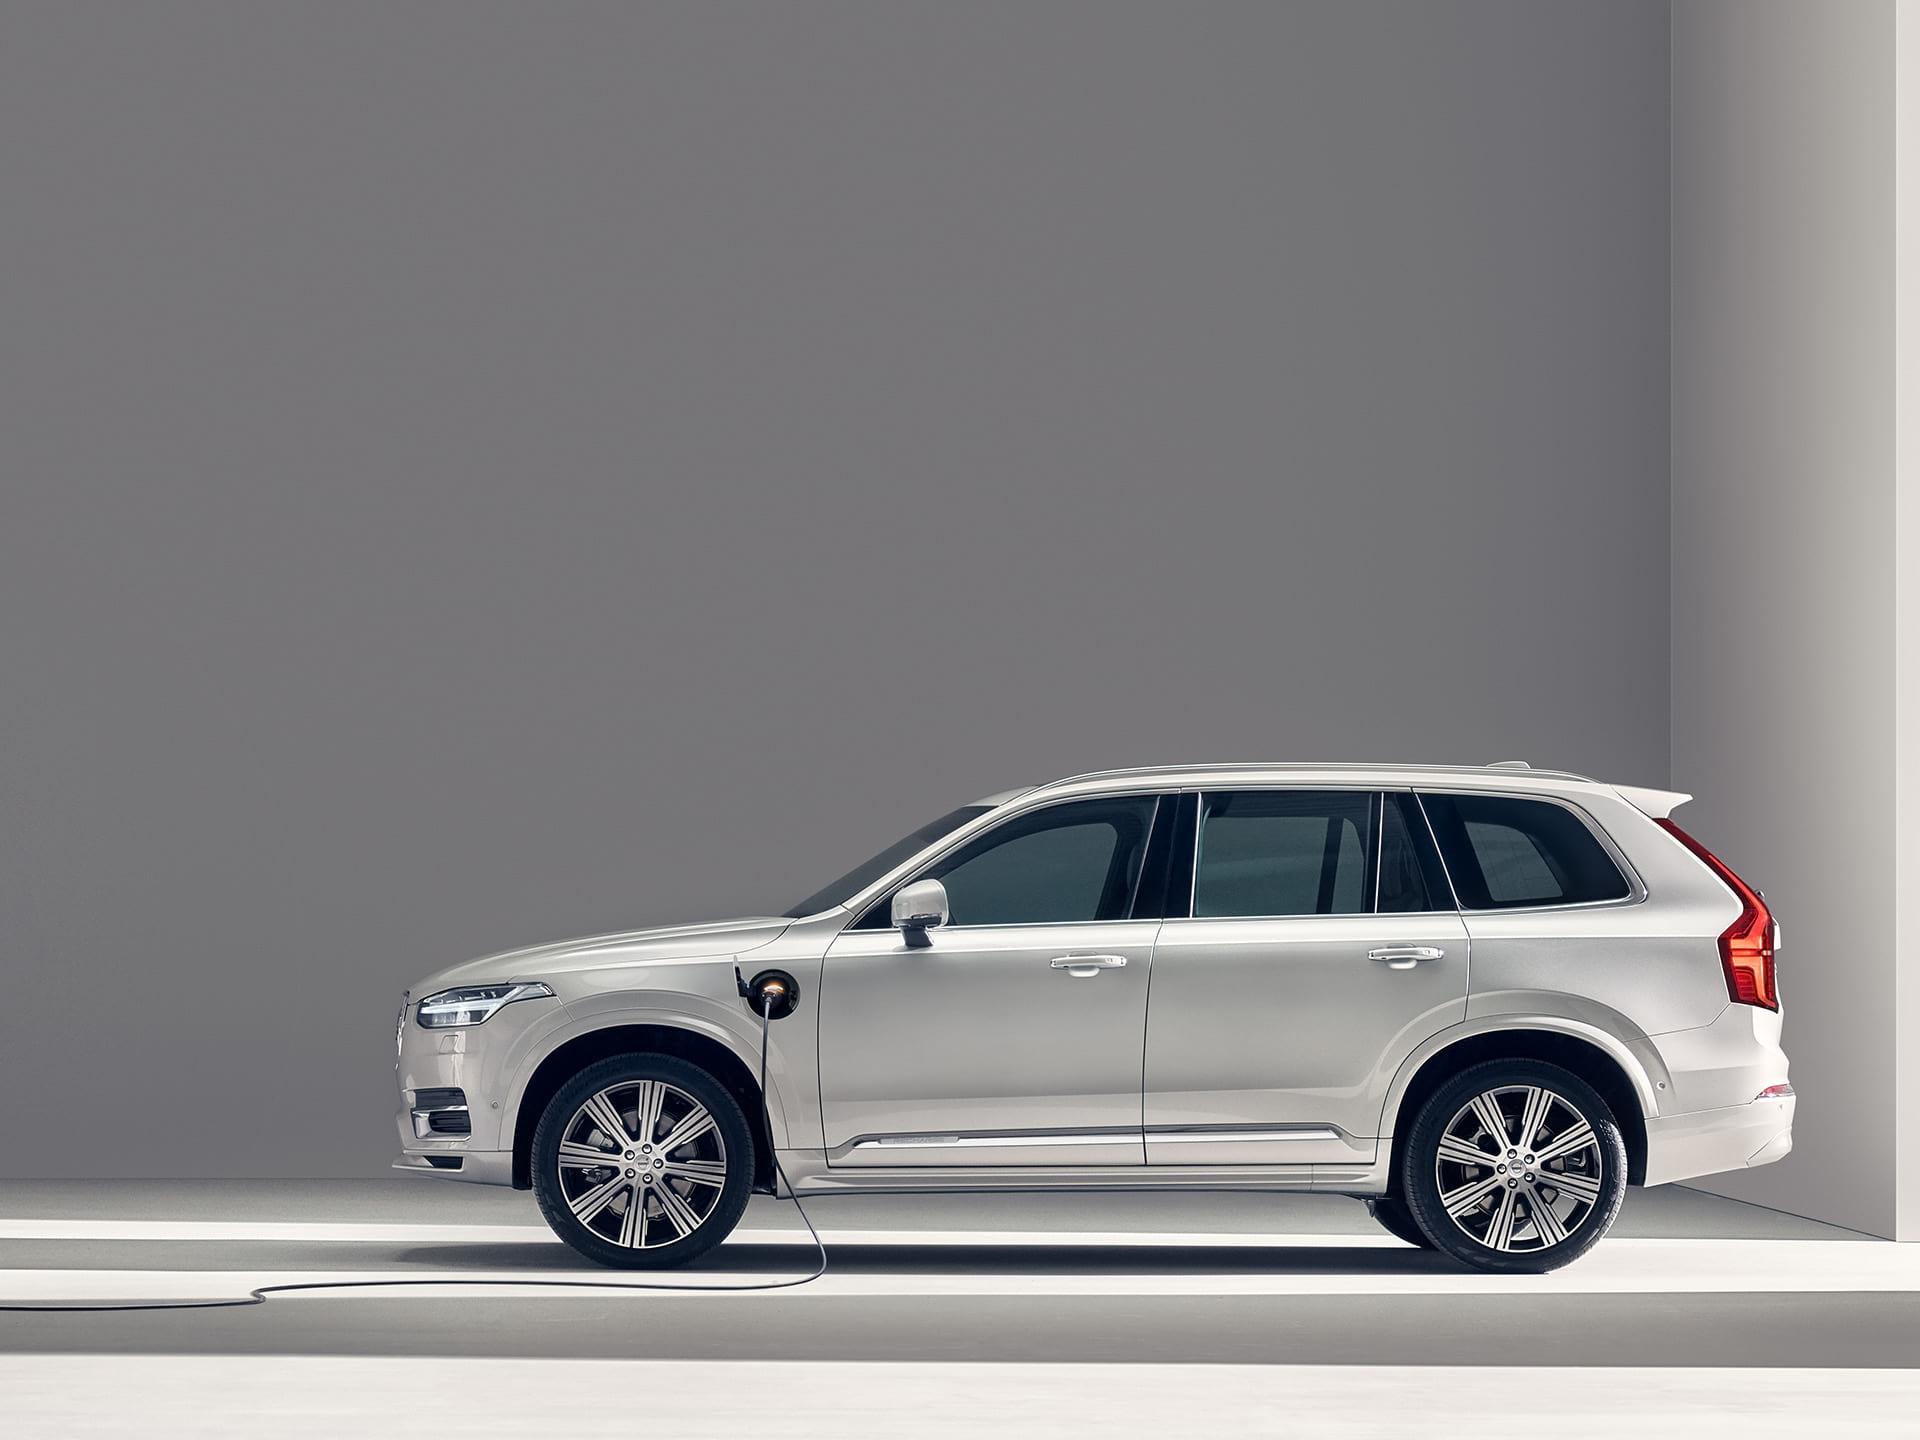 En Volvo XC90 Recharge laddhybrid-SUV laddas.